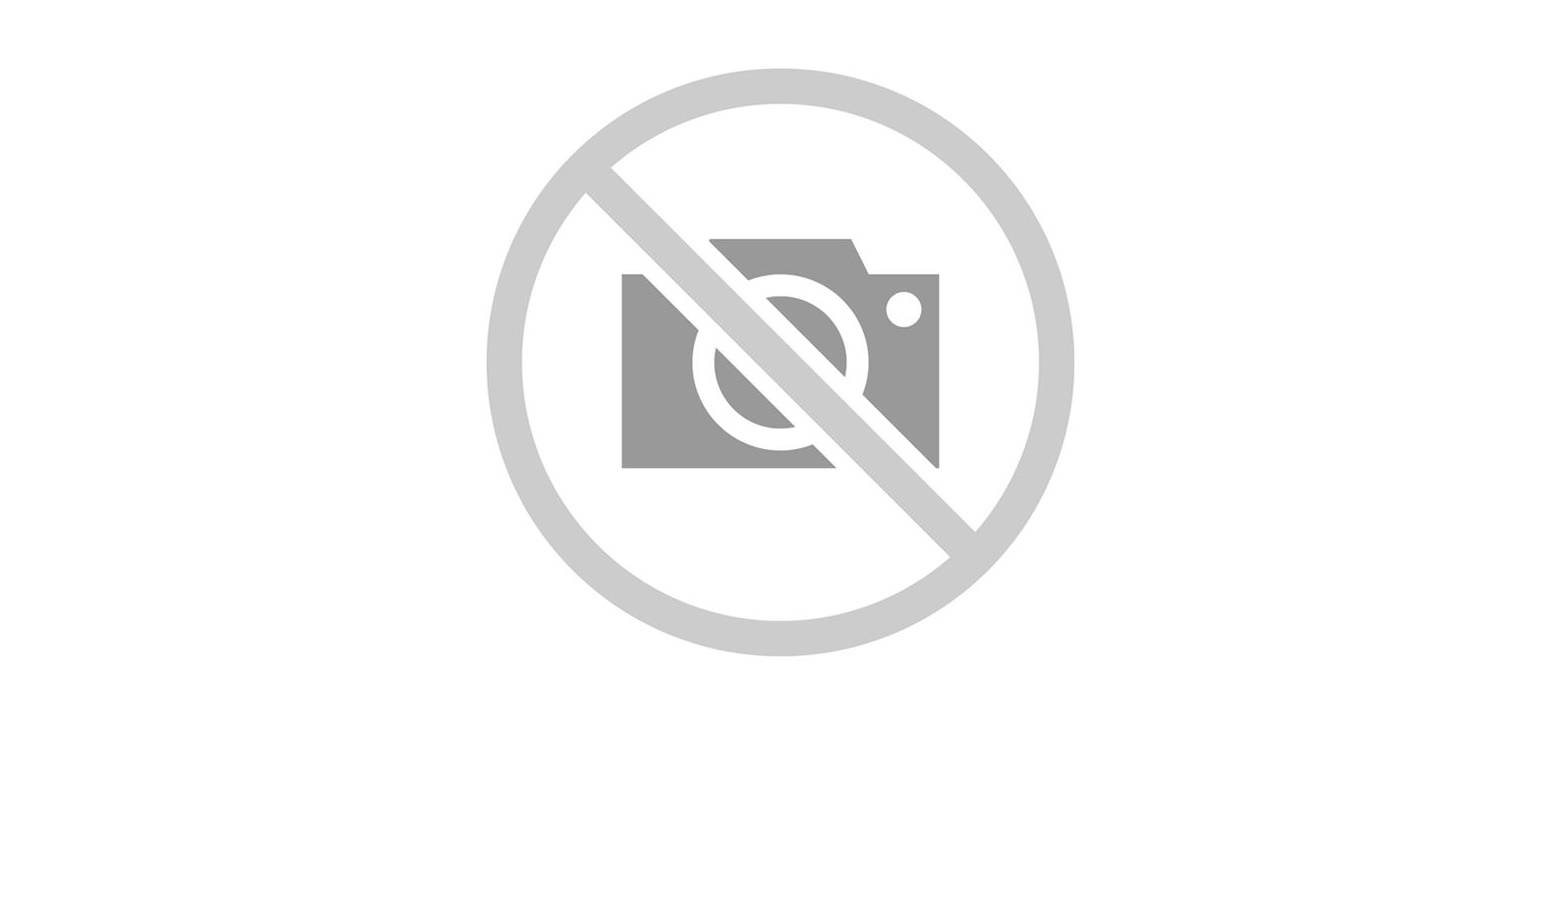 BASLIK+AYAKUCU HIPERIA PLUS 200x200 GRI (M0018)